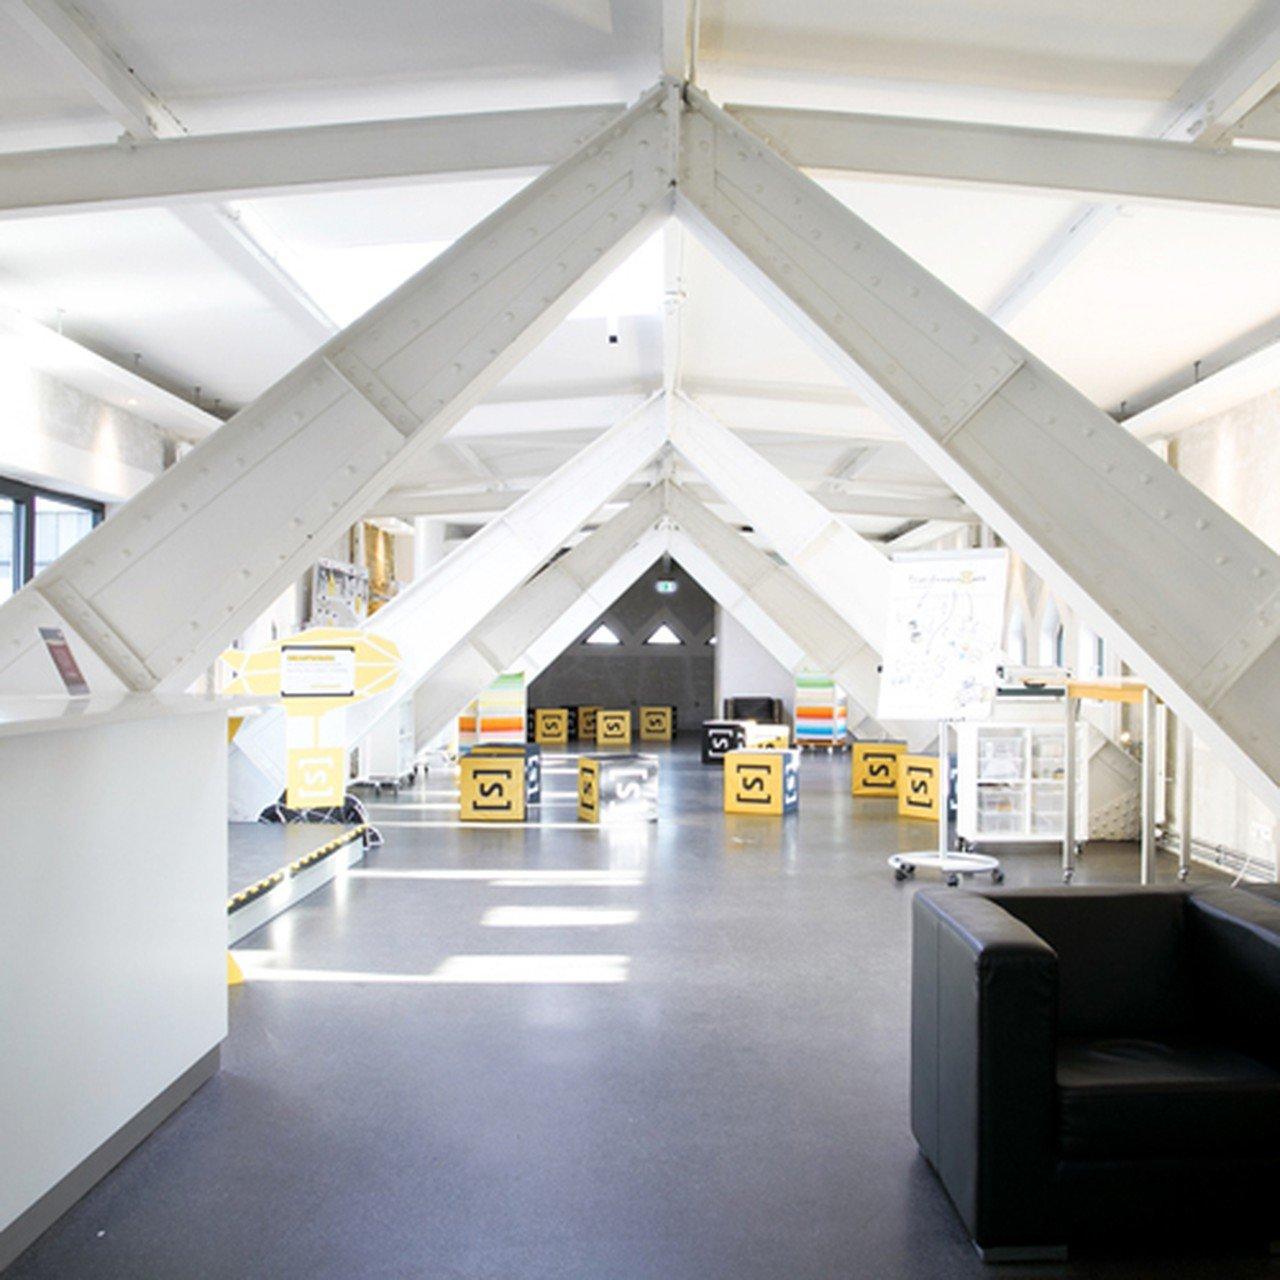 Hannover workshop spaces Lieu industriel TRANSFORMATIONSWERK - Luftschloss image 1